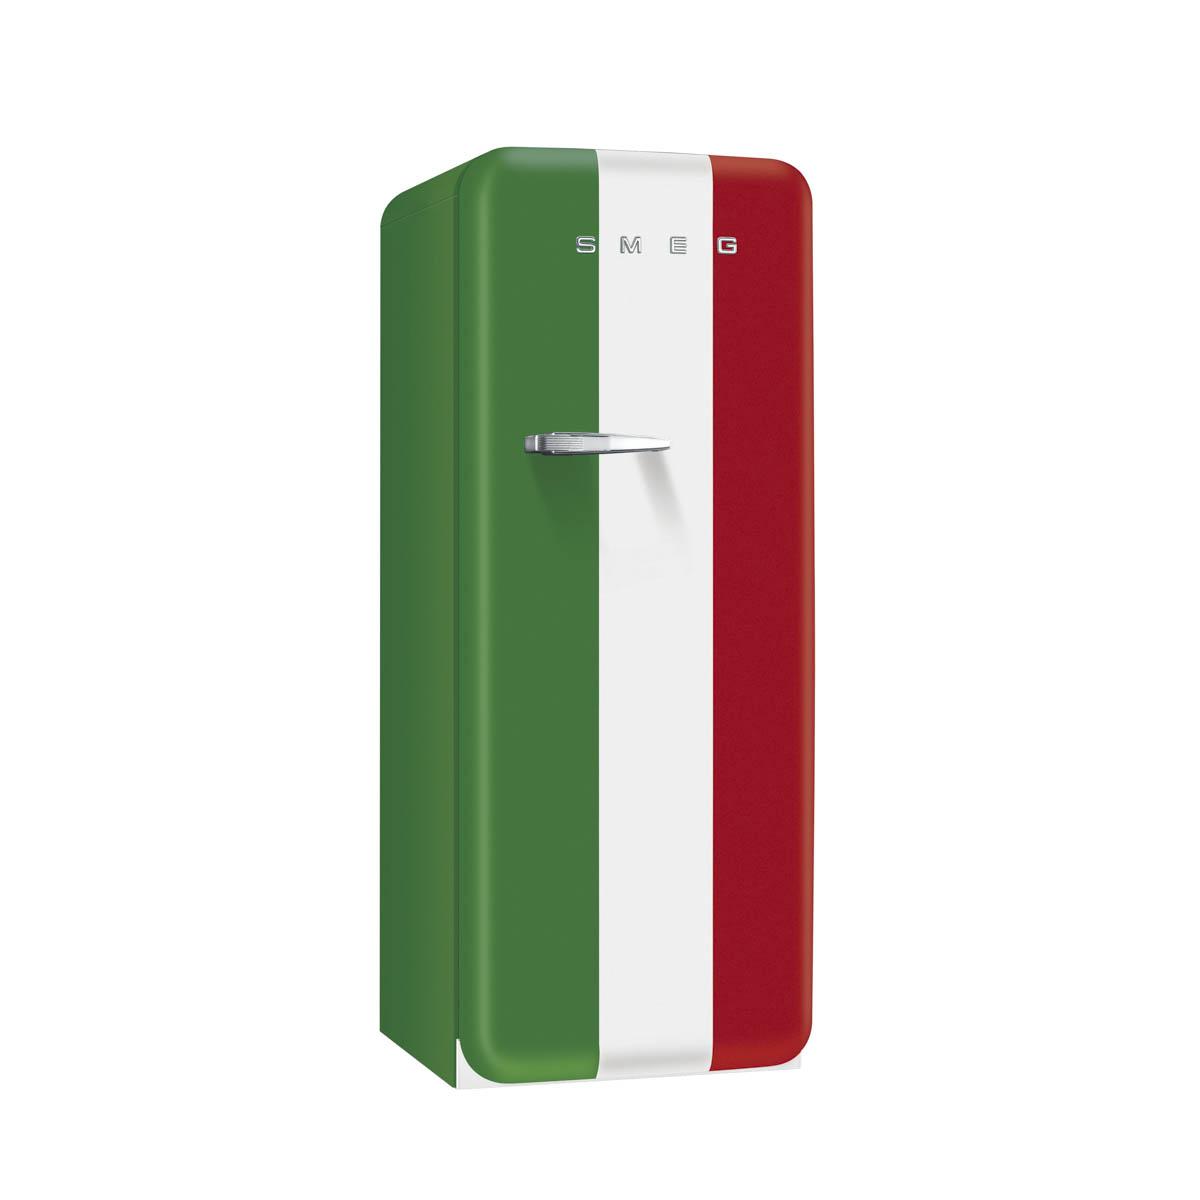 SMEG Kühlschrank Flagge › Meilenstein Manufaktur